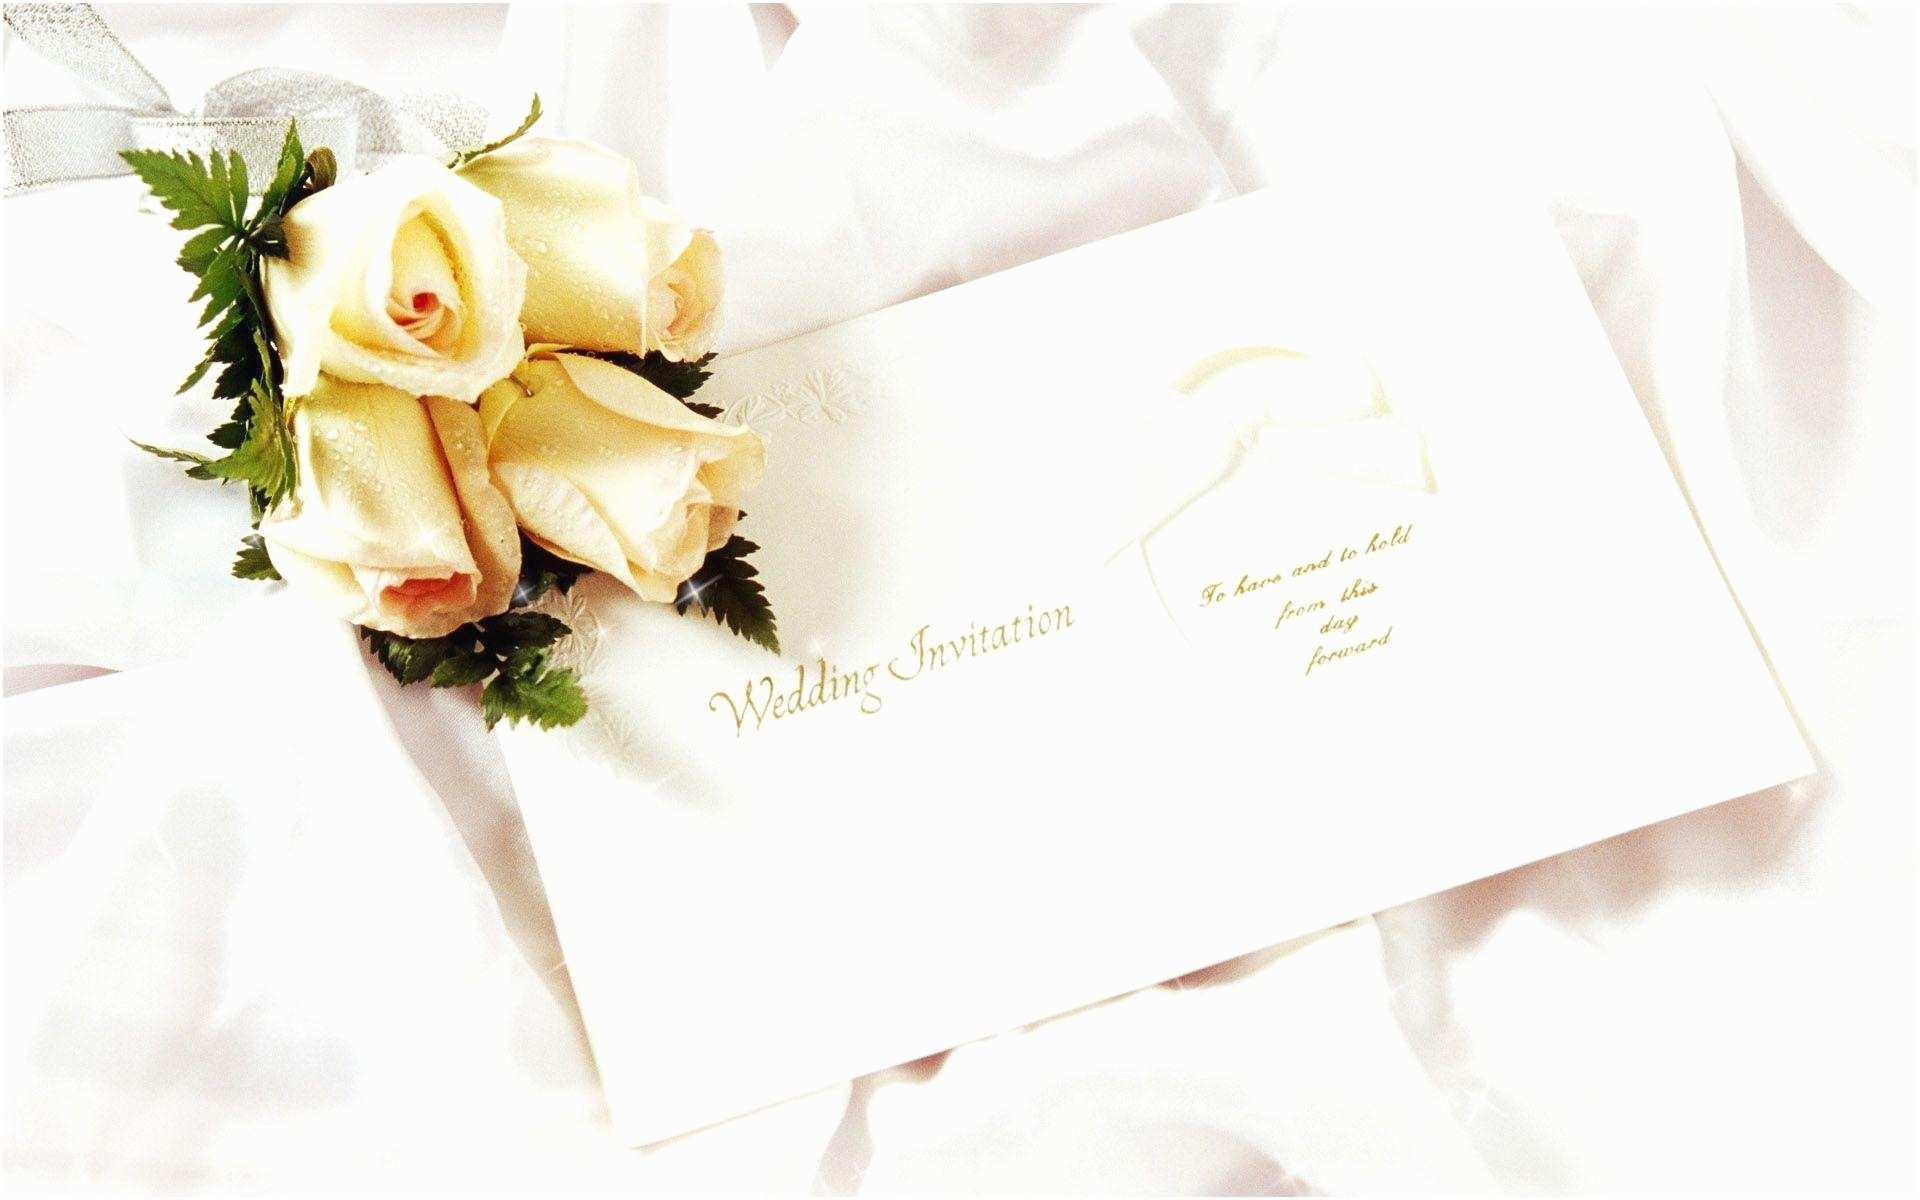 Wedding Invitation Background Hd Wedding Backgrounds Wallpaper Cave